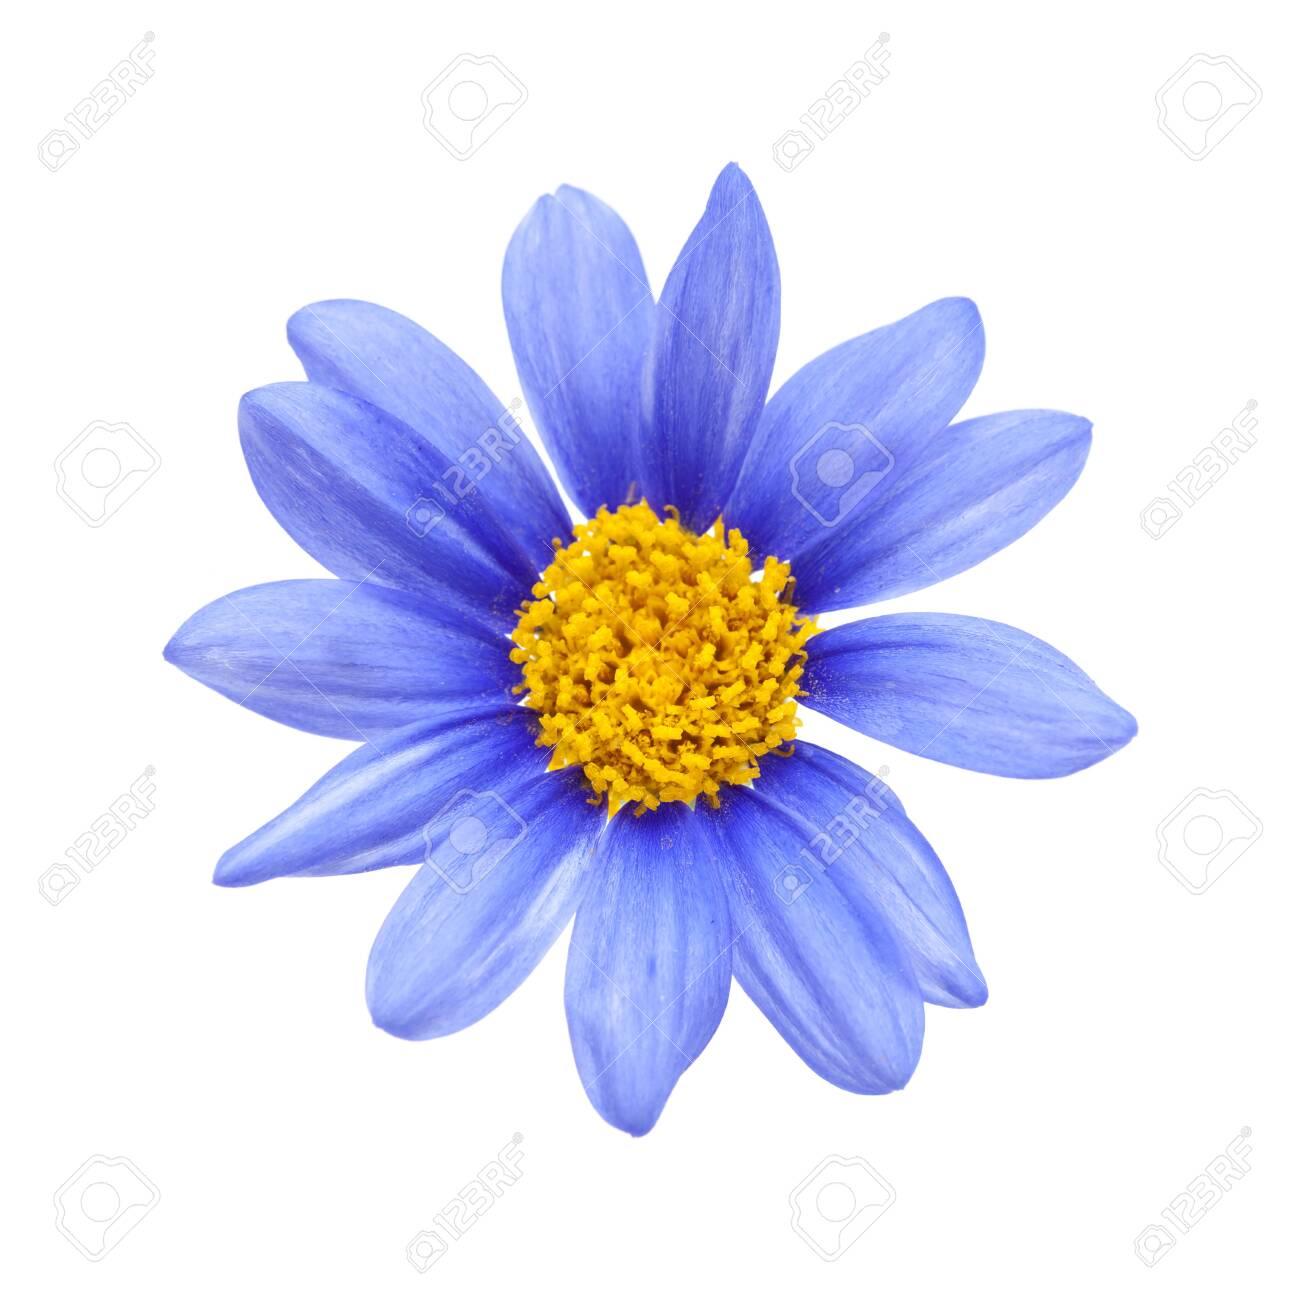 blue daisy bush Felicia amelloides flower isolated on white - 122983150